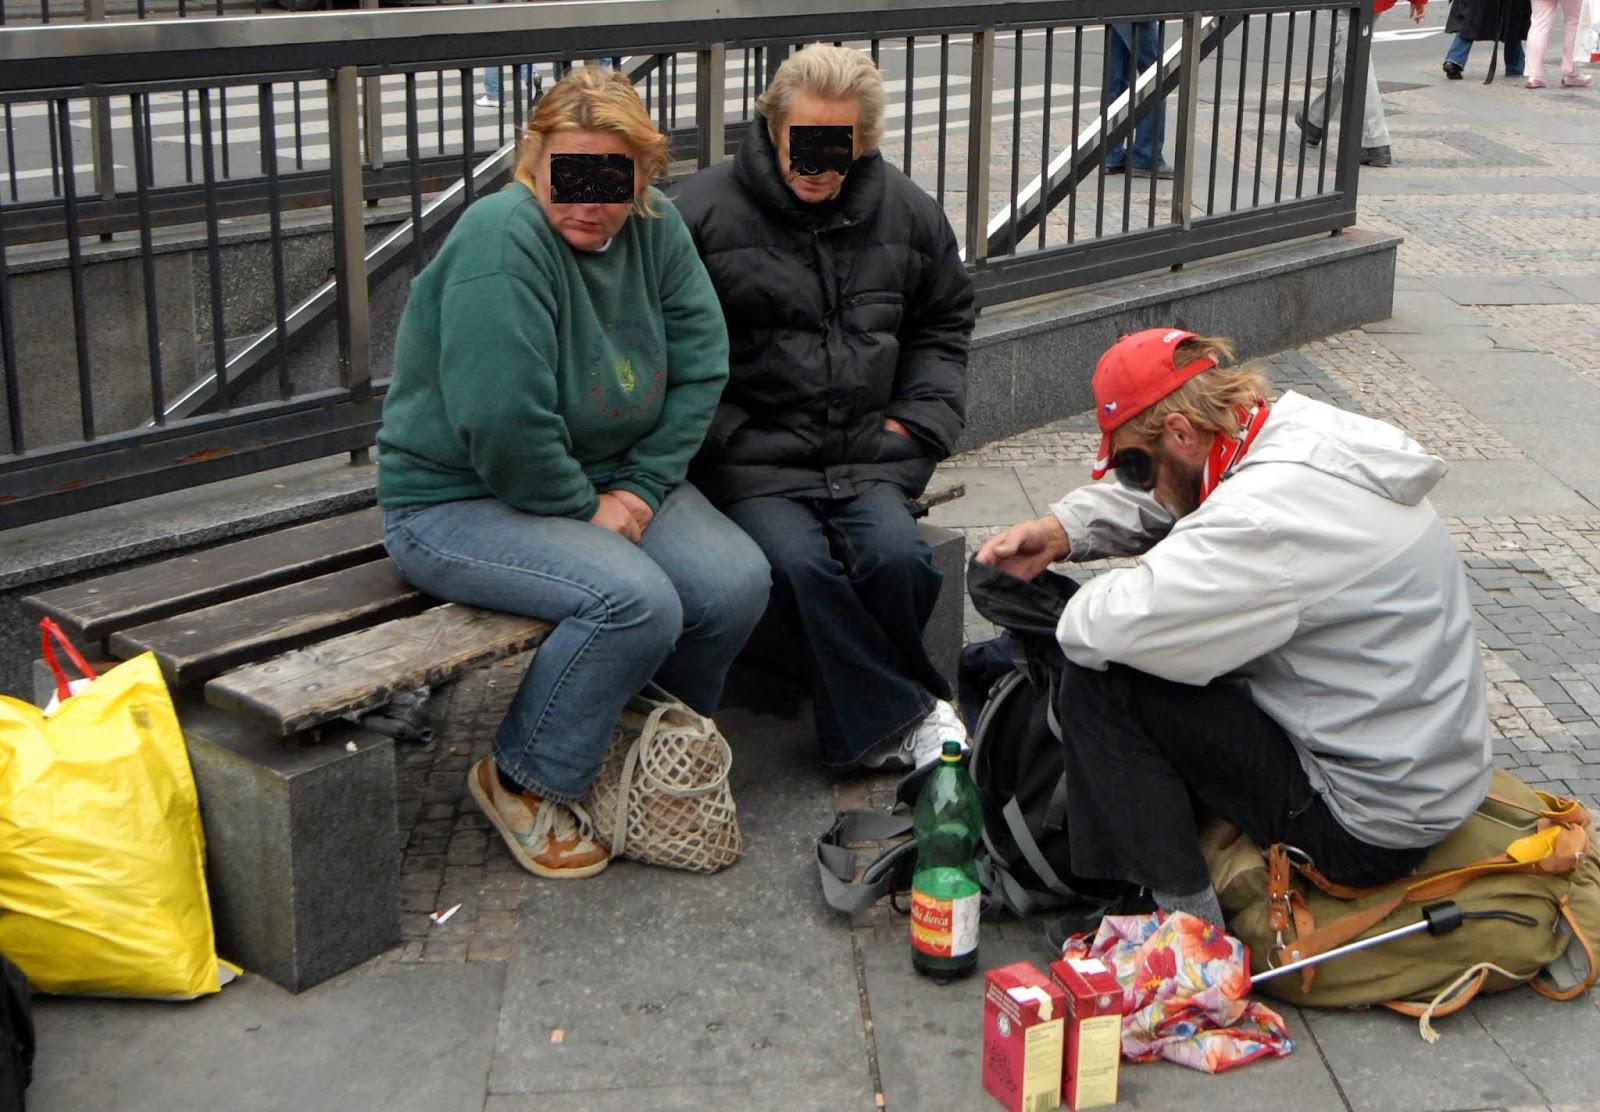 Chodit s bezdomovcem